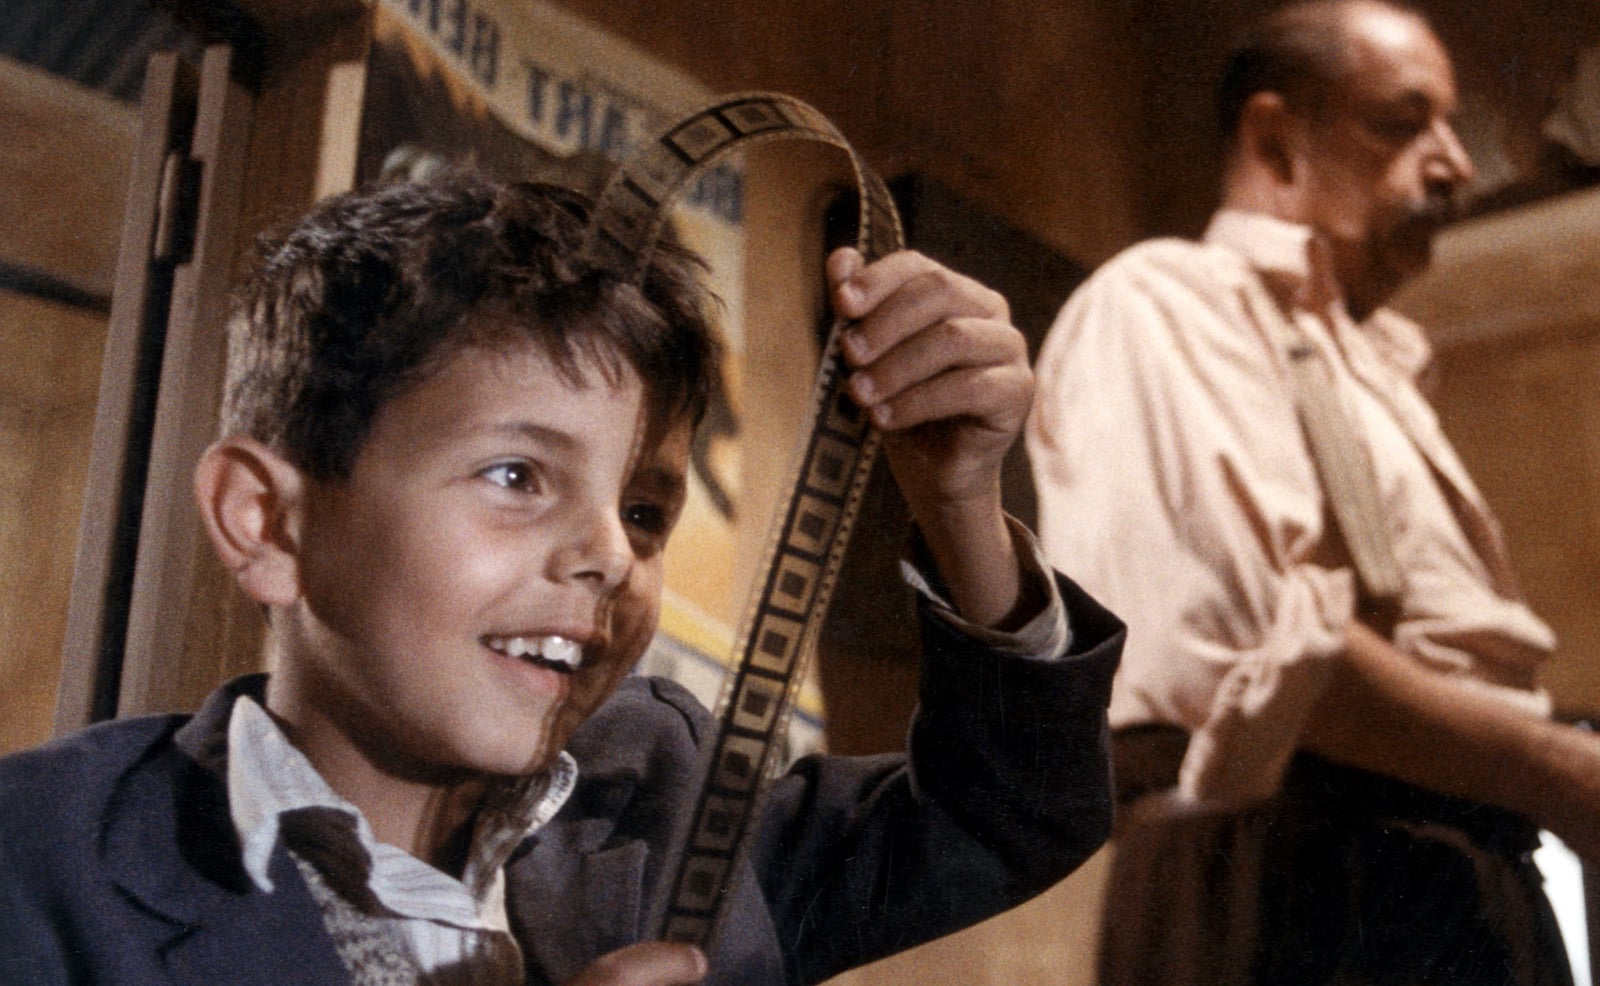 nuovo-cinema-paradiso-oscar-30-anni-fa-copia